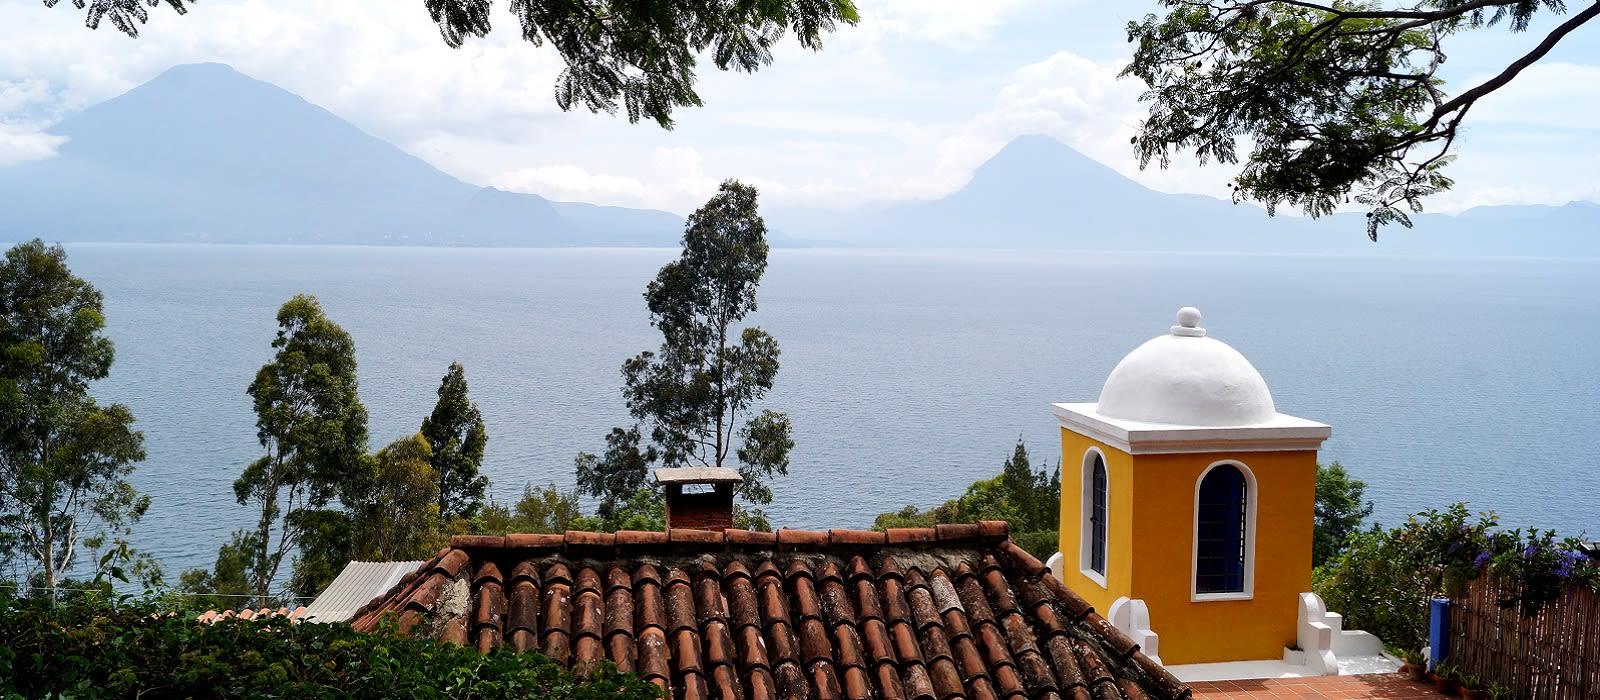 Hotel Casa Palopo Guatemala